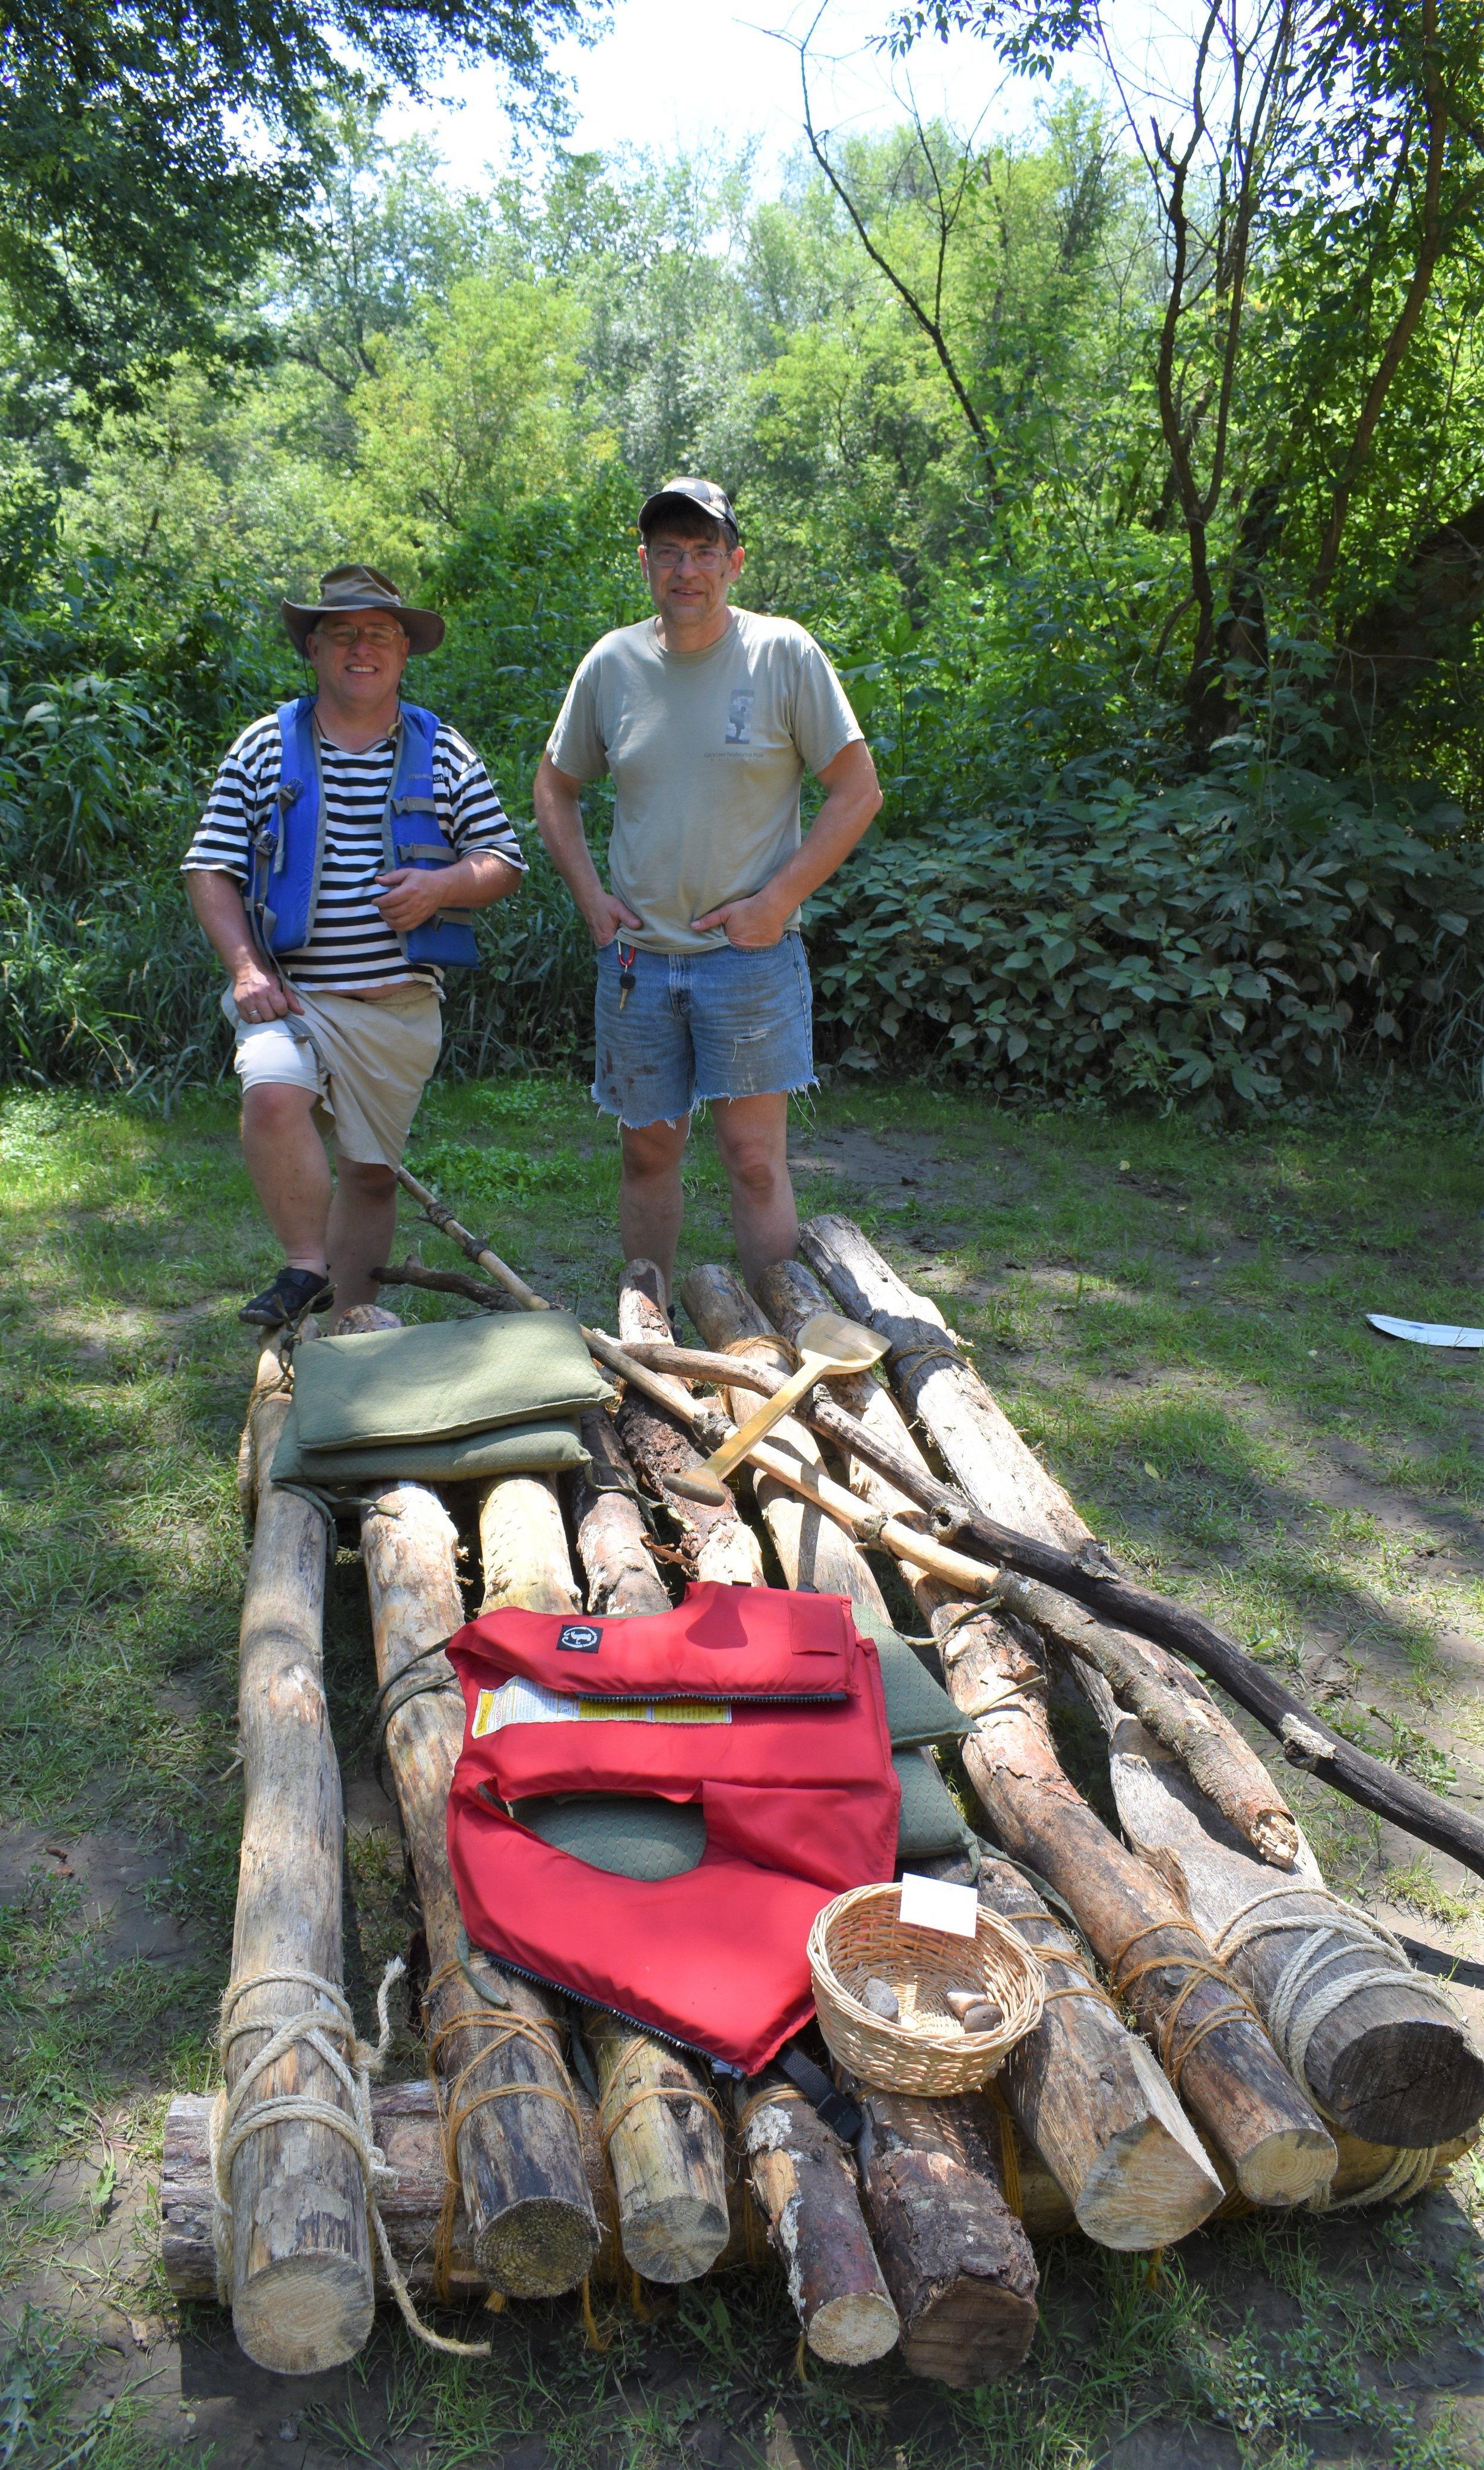 Raft 1- Joel Baker of DesMoine, IA and Scott Lind of Ontario